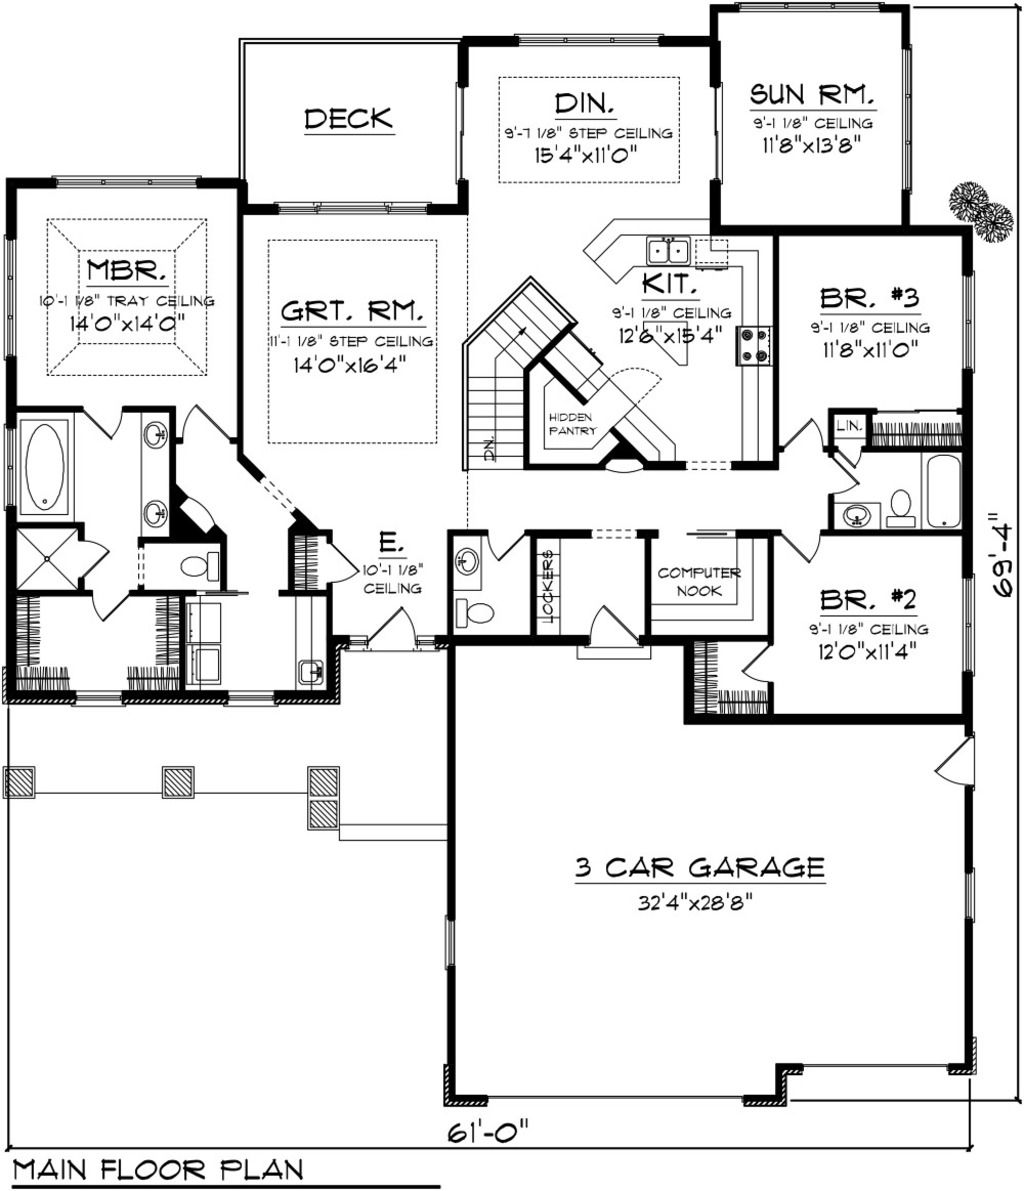 Craftsman Style Det Garage Garage Plans: 3 Beds 2.50 Baths 2196 Sq/Ft